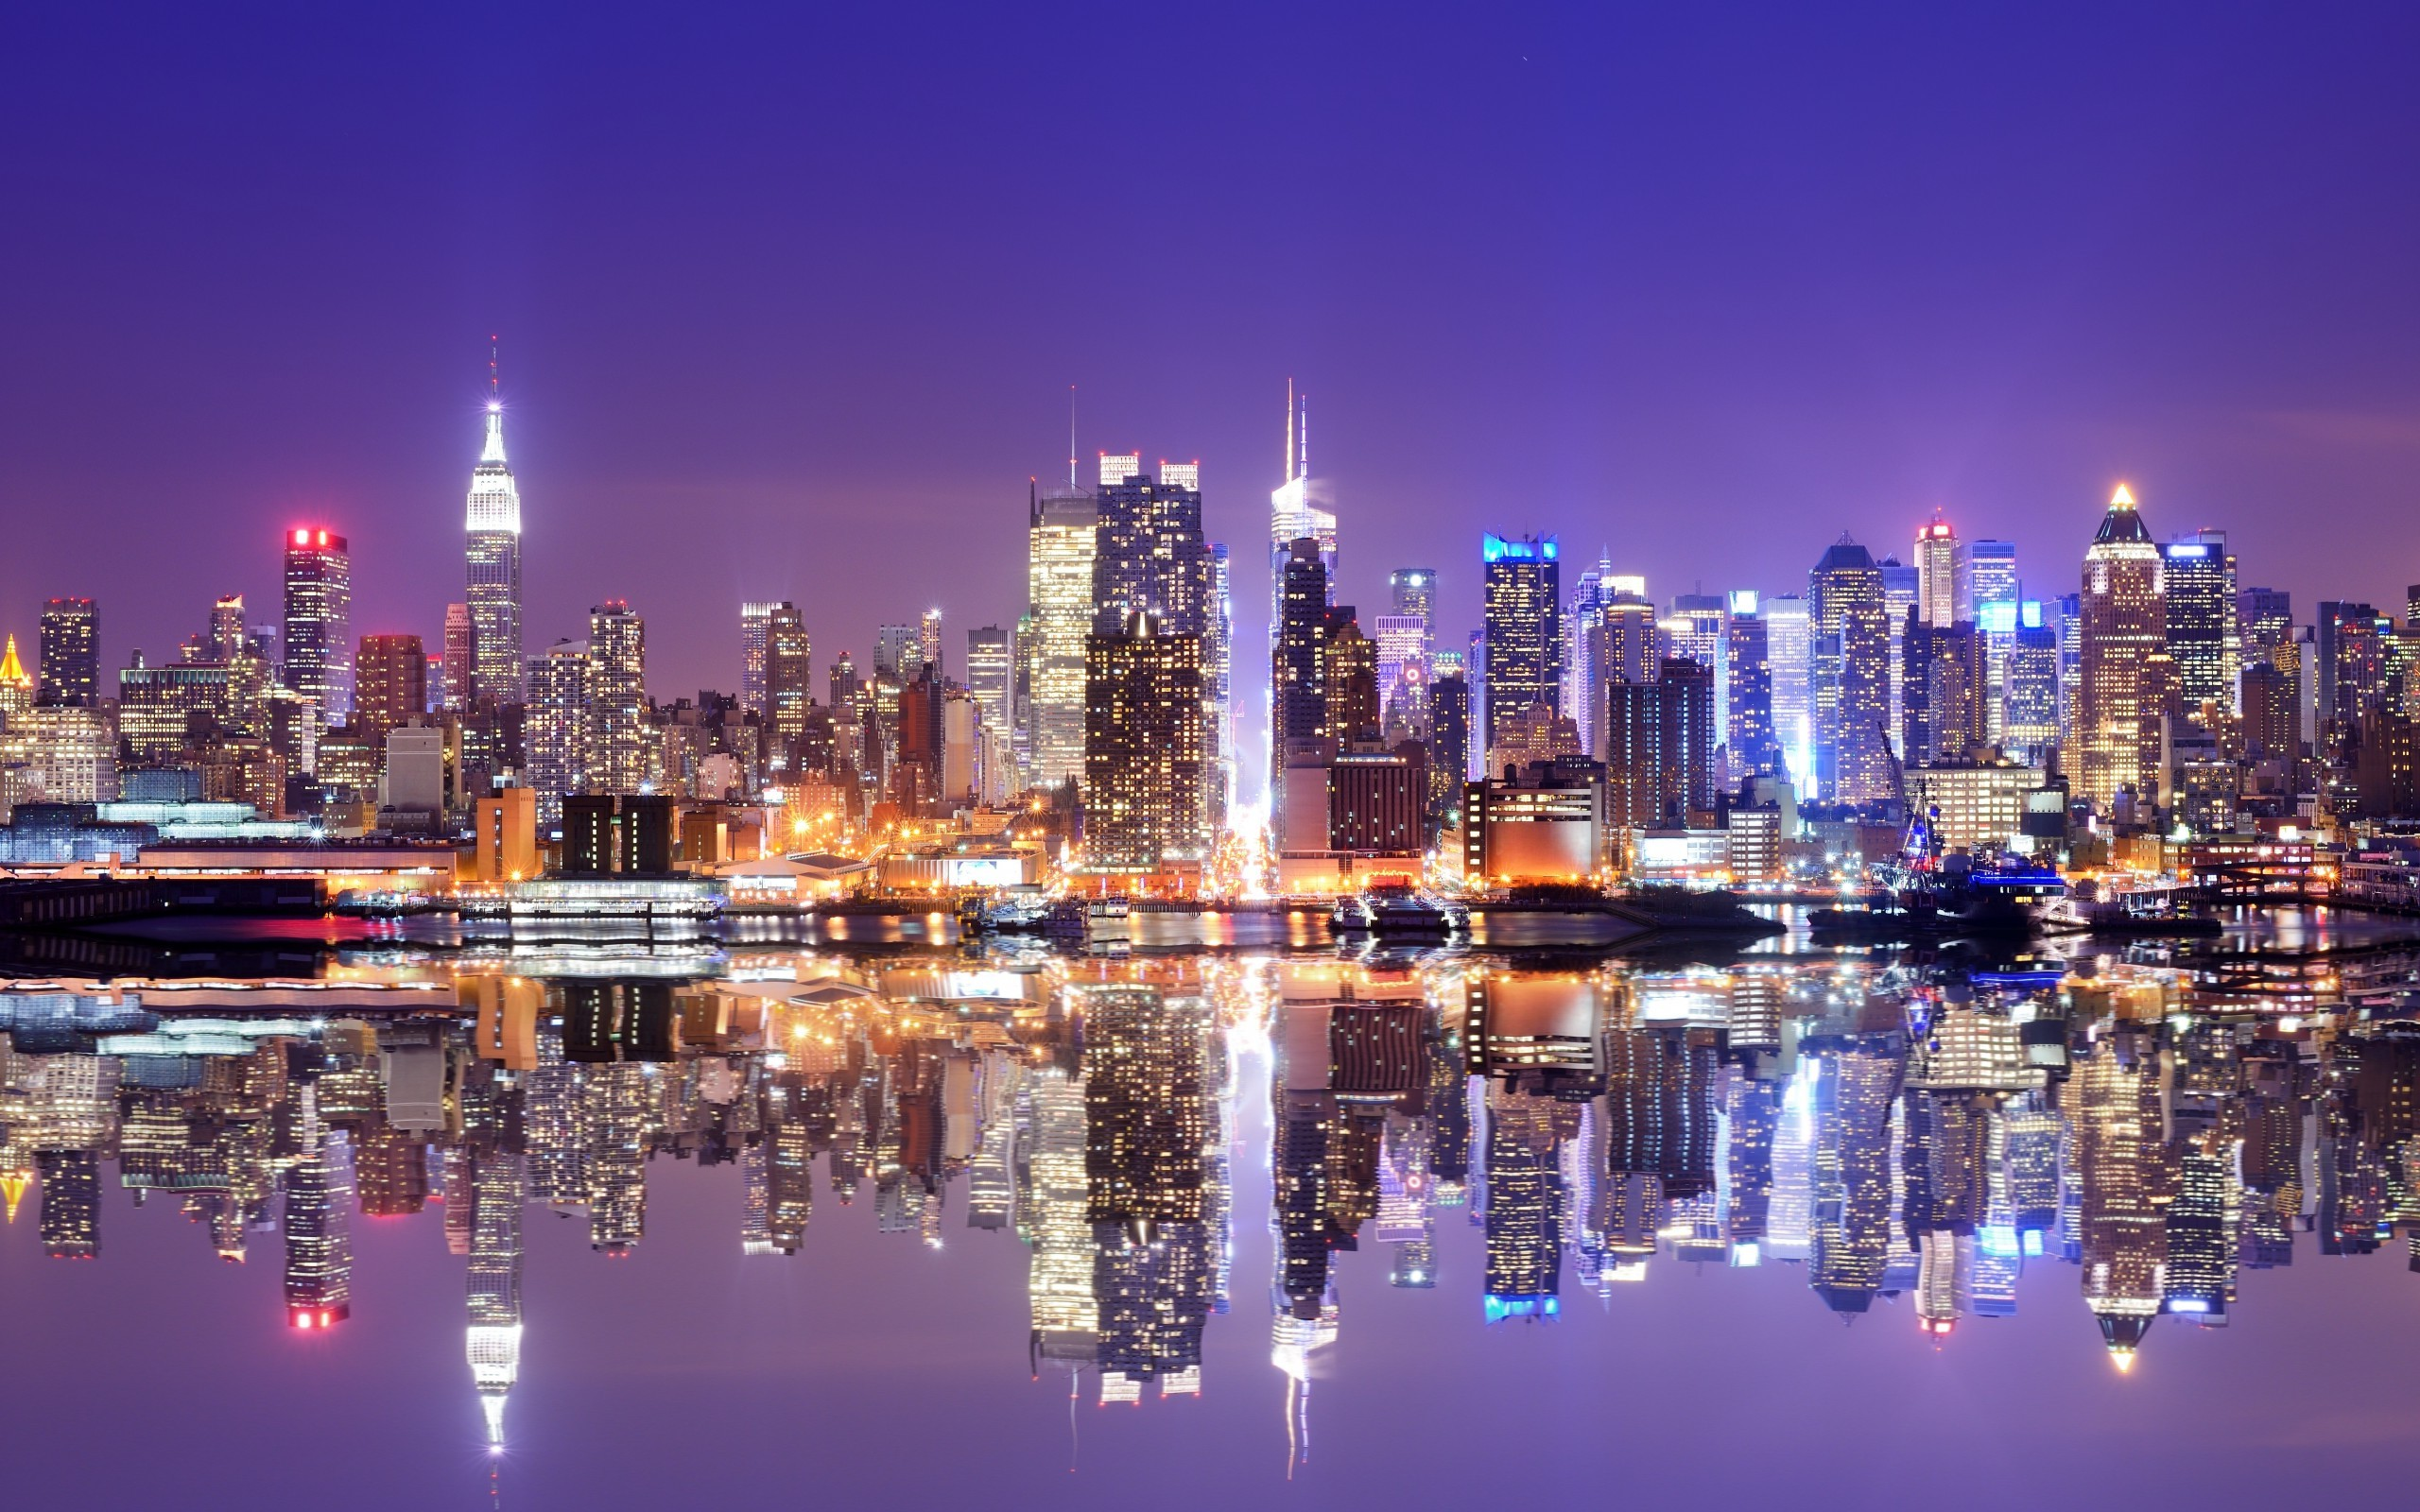 New York Landscapes images Free photo new york landscape urban york skyline free jpg